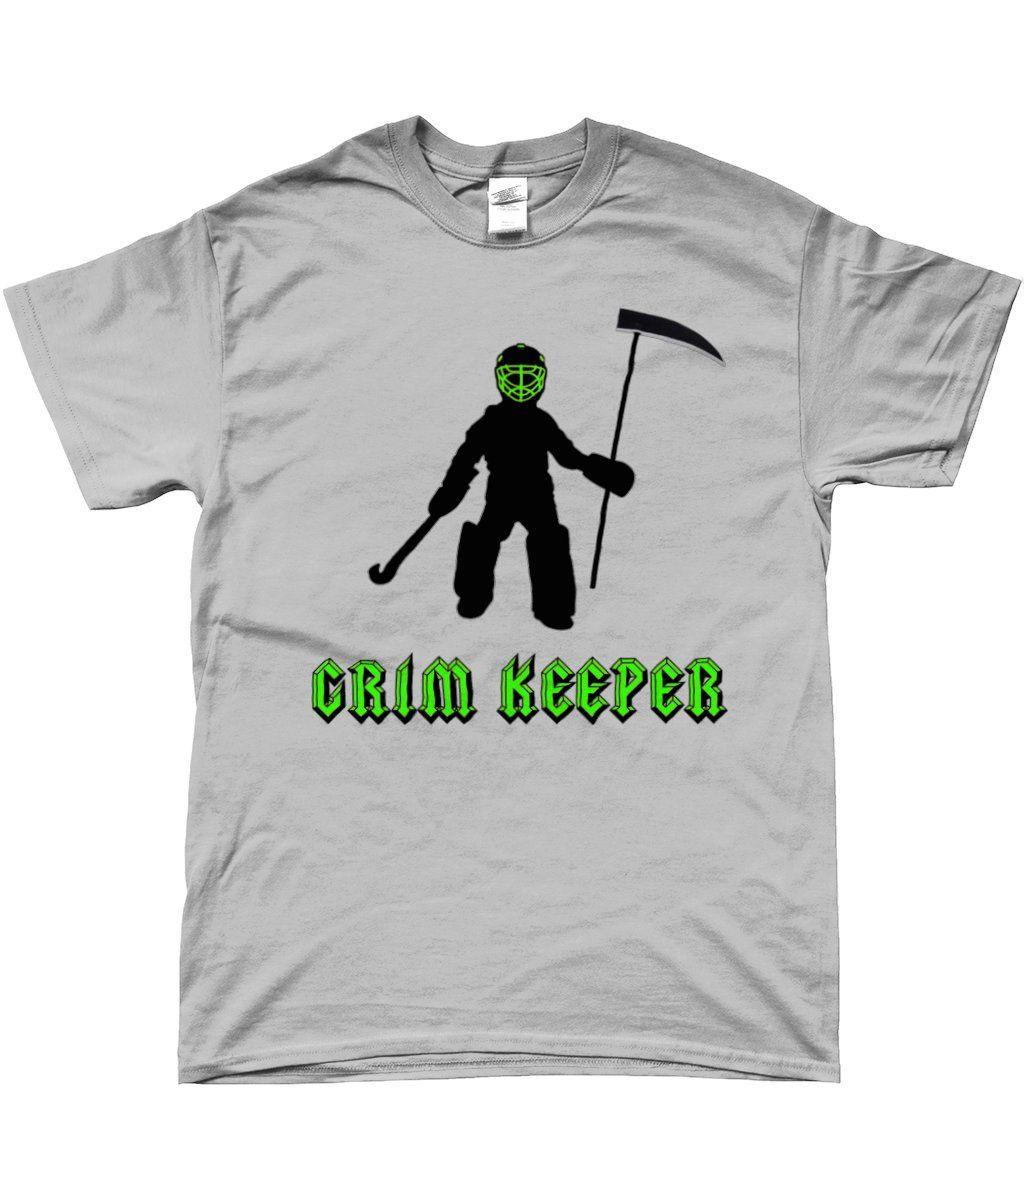 Field Hockey Goalkeeper T Shirt Grim Keeper Funny Hockey